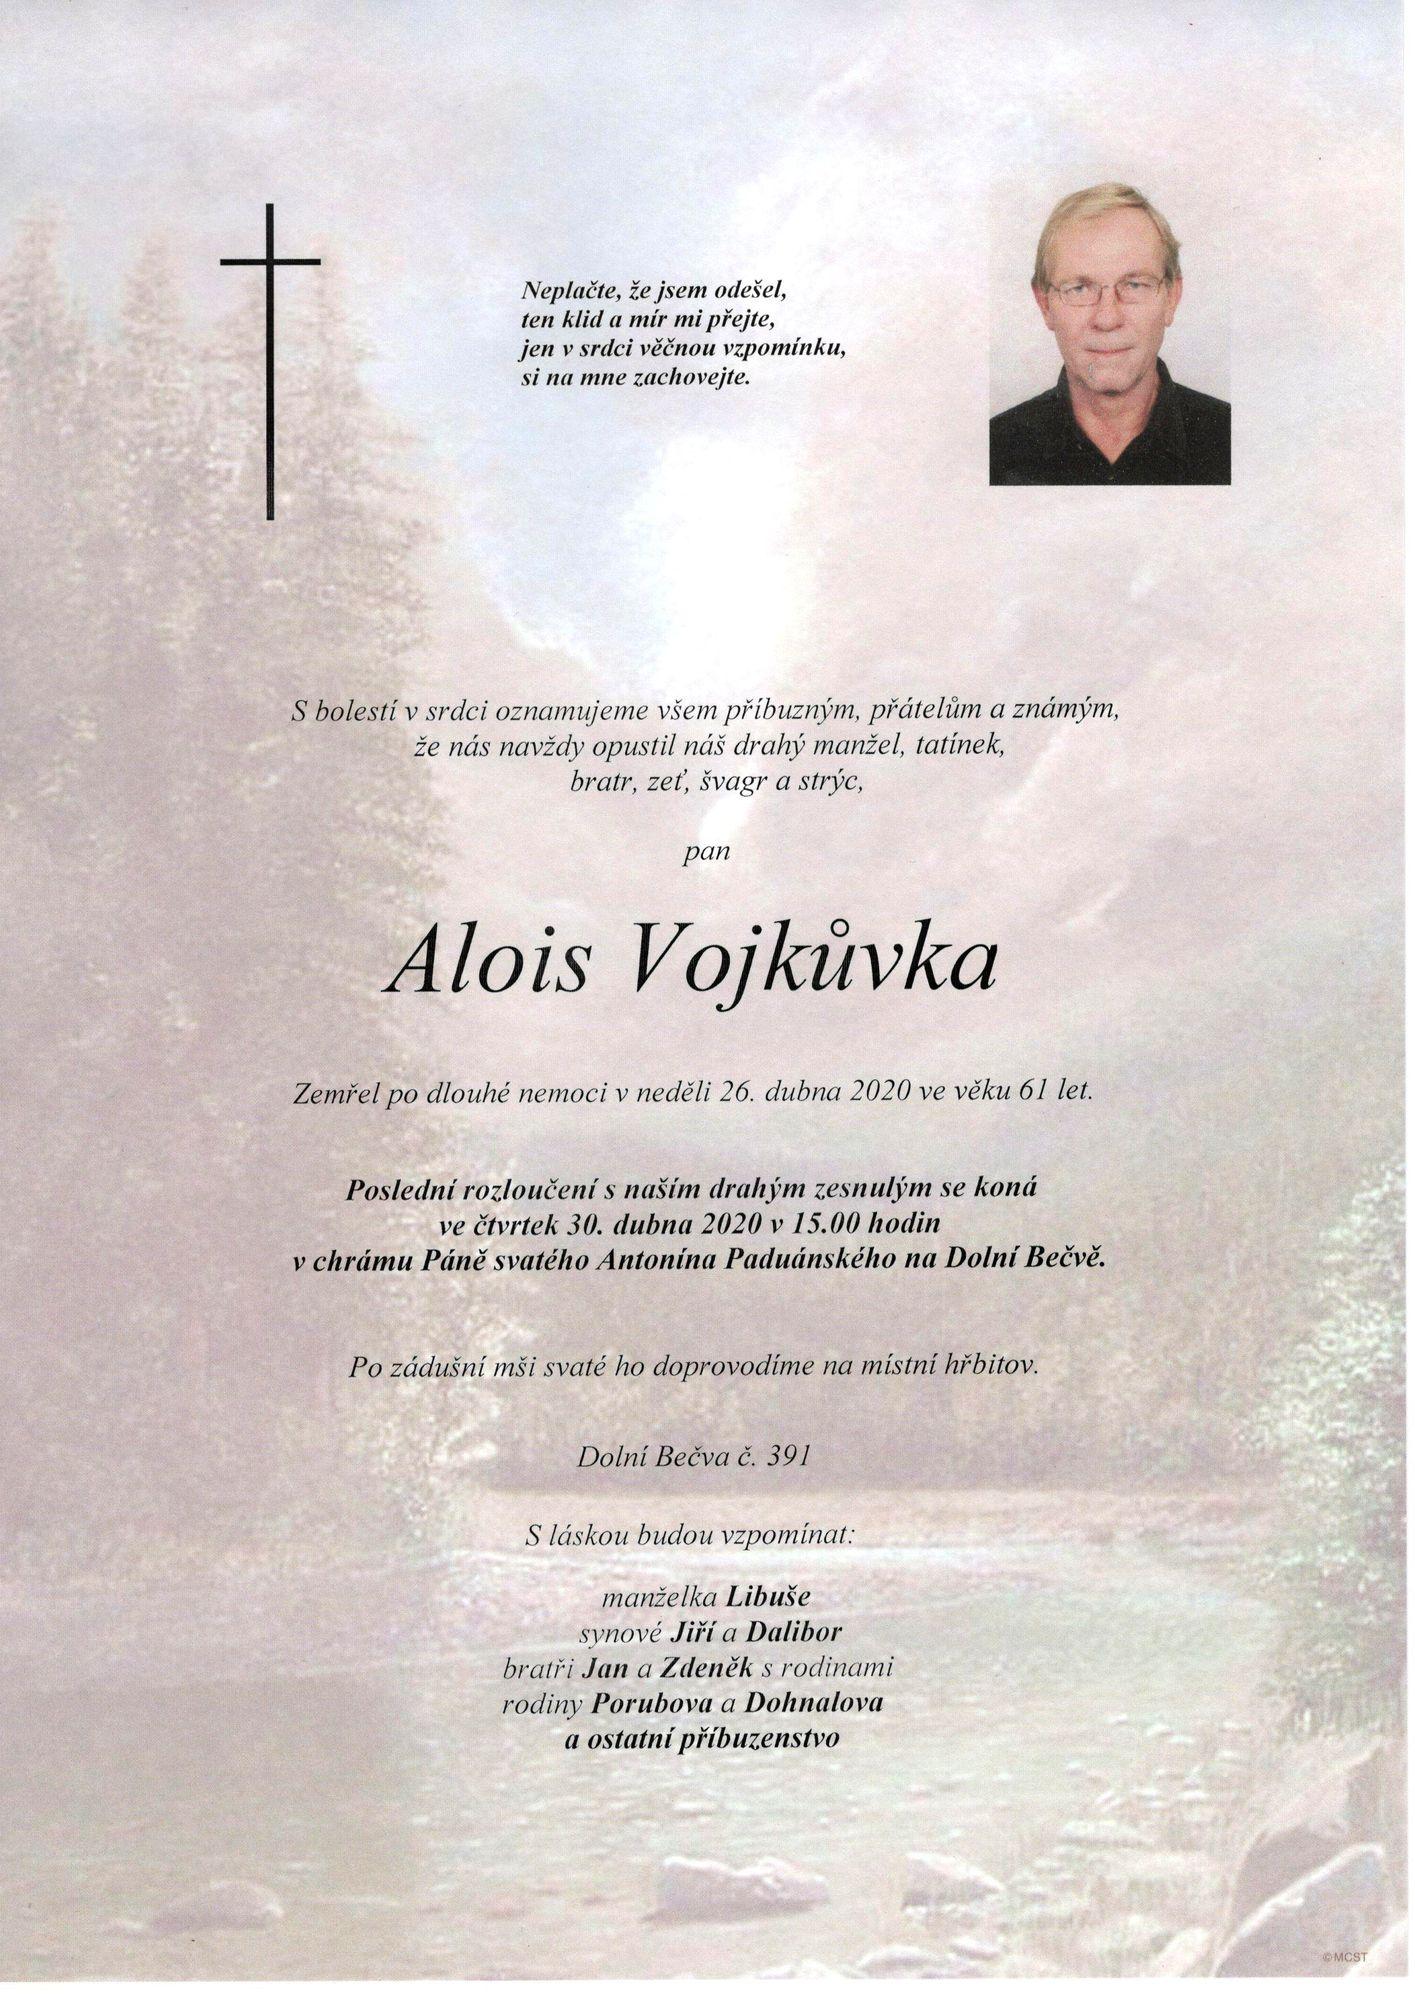 Alois Vojkůvka